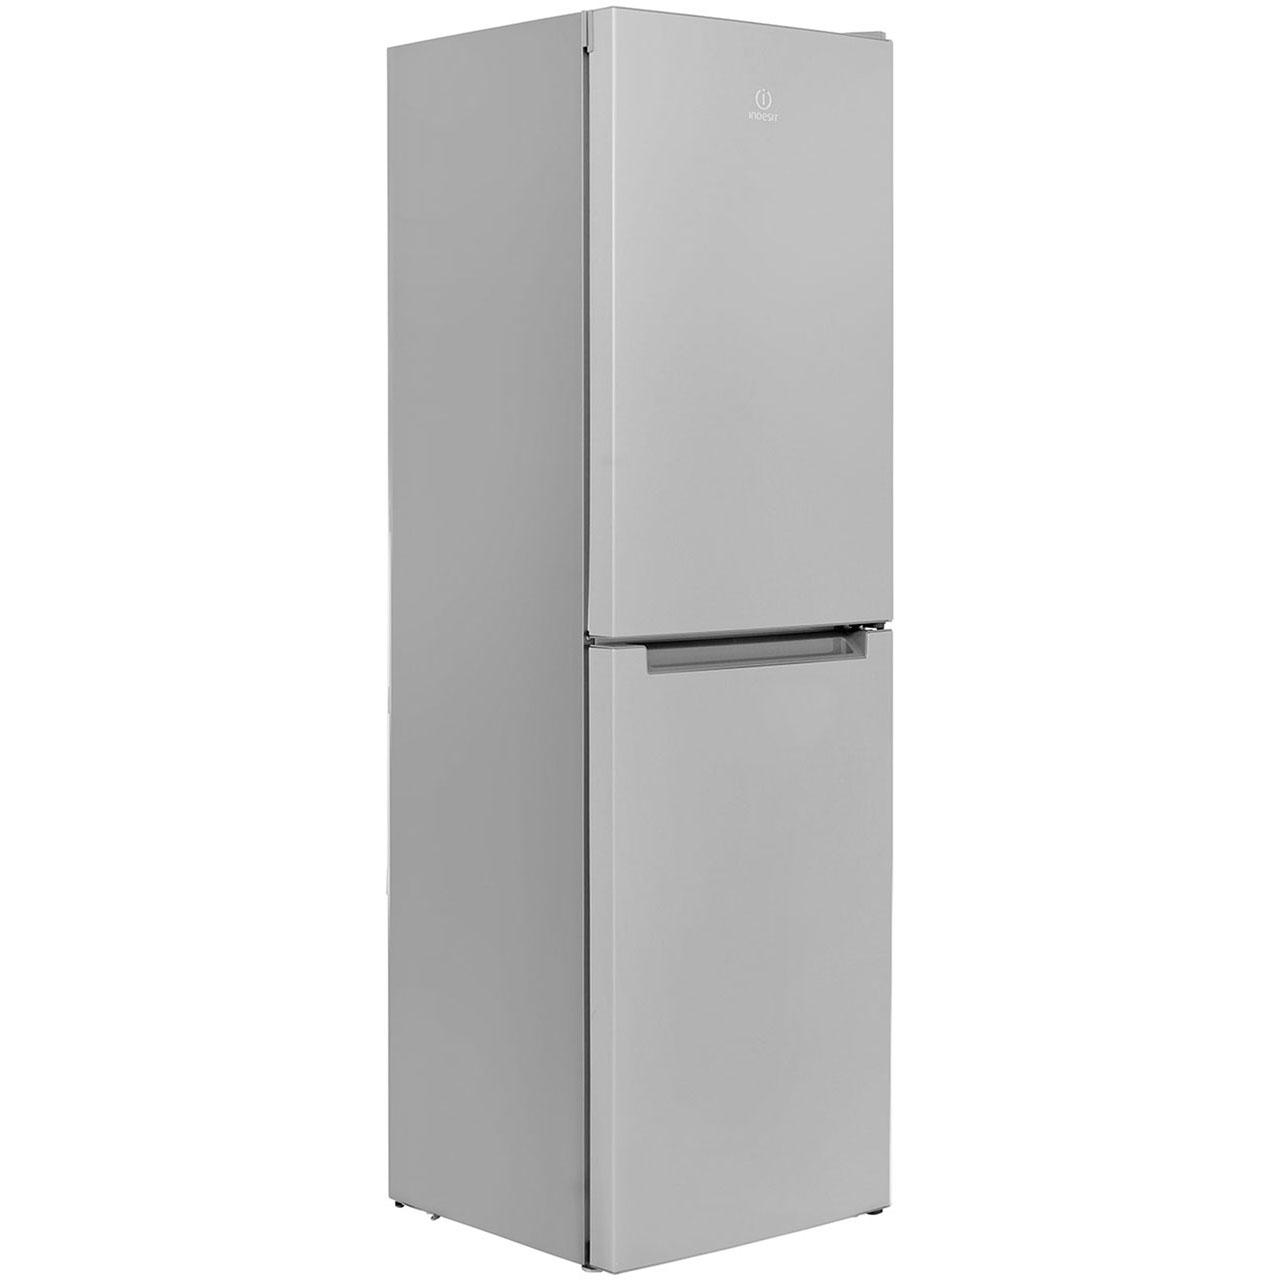 buy cheap indesit frost free fridge freezer compare. Black Bedroom Furniture Sets. Home Design Ideas